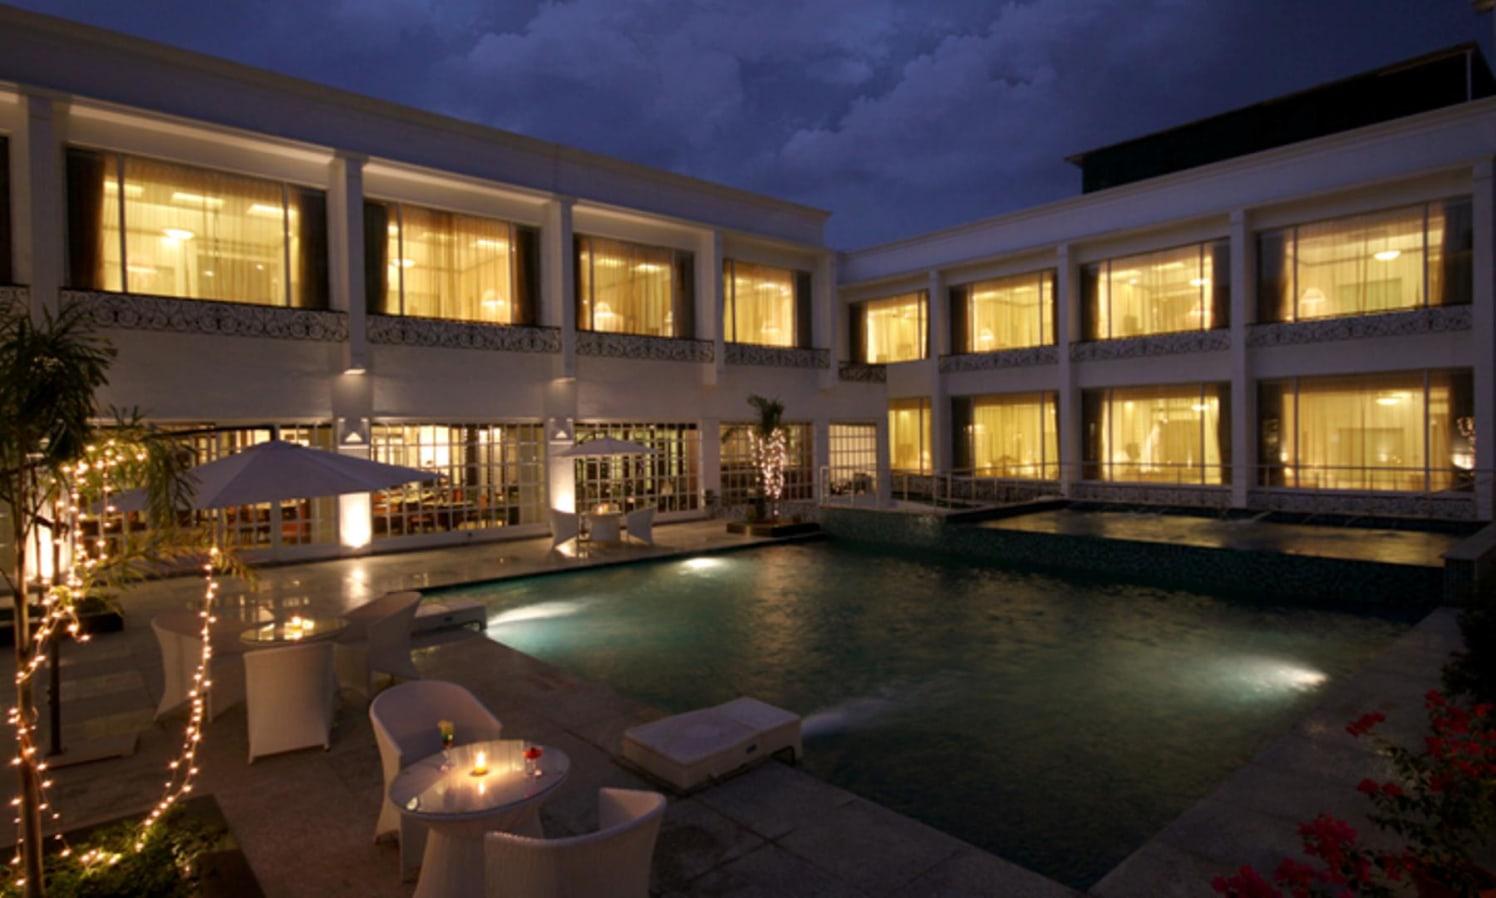 Dine By The Pool by shailendra m prasad  Modern Minimalistic | Interior Design Photos & Ideas